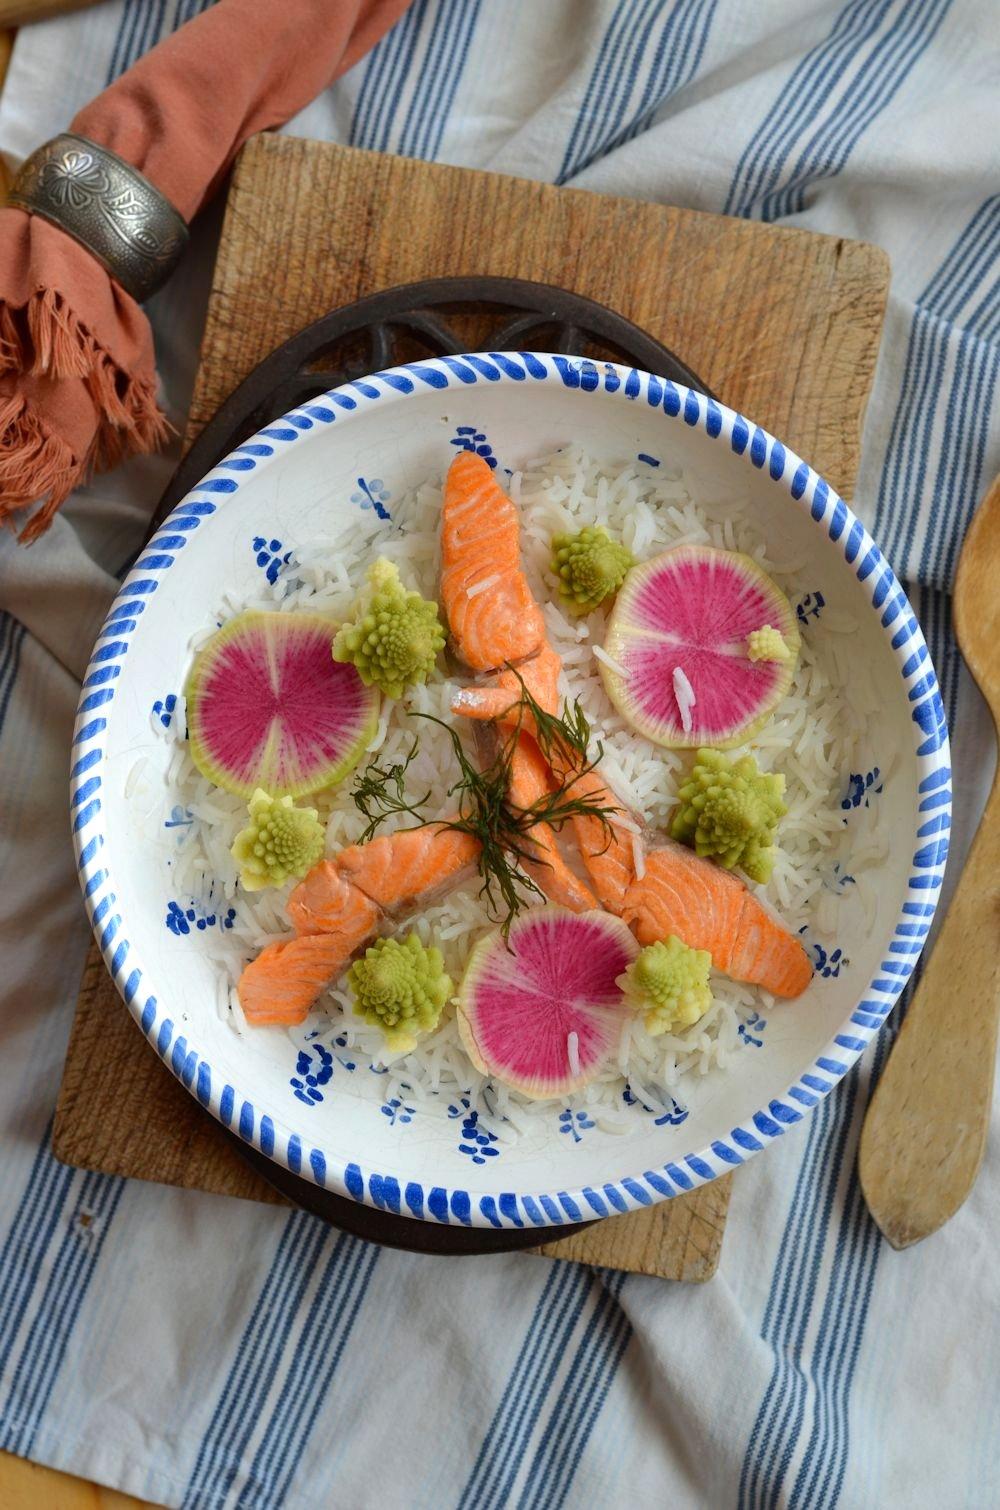 Salade de riz à la truite, chou romanesco et radis asiatique